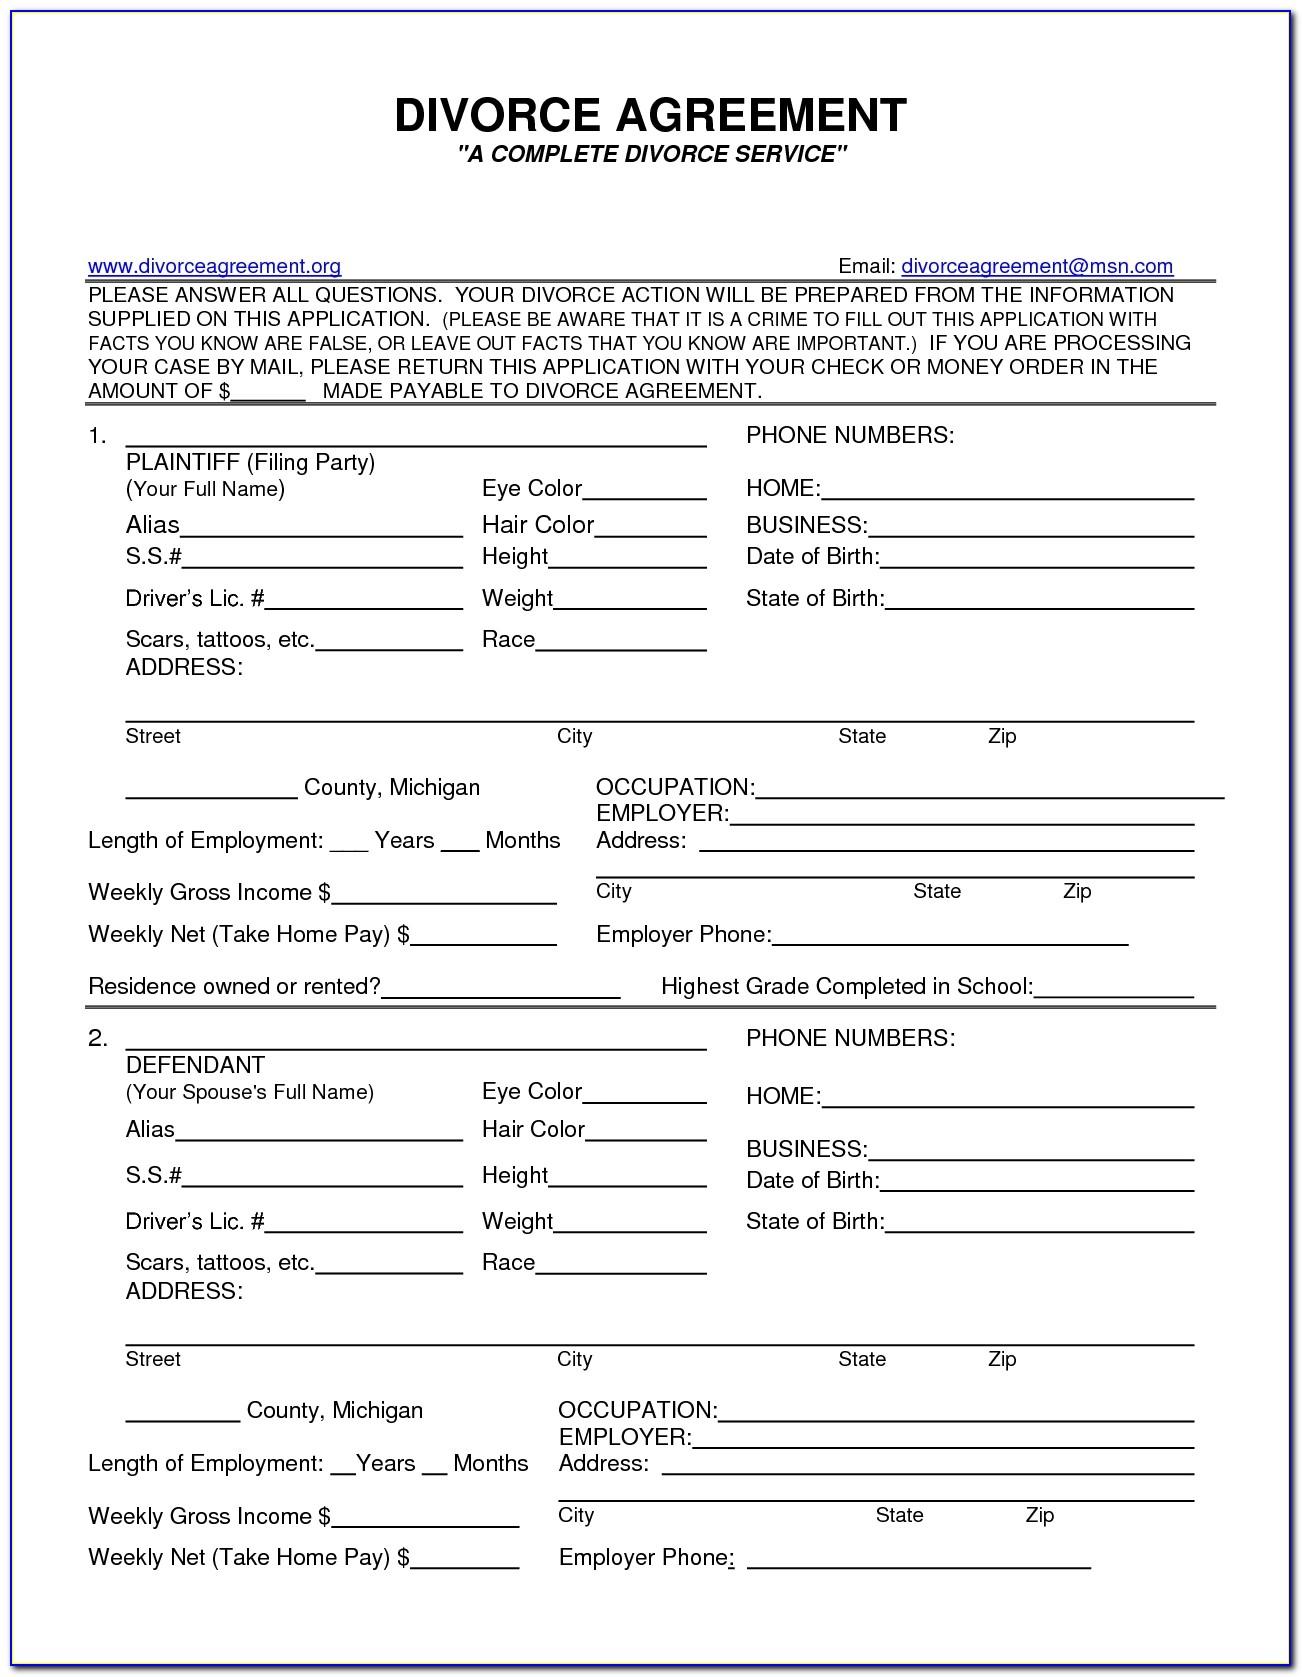 Fake Divorce Papers Pdf | Worksheet To Print | Fake Divorce Papers With Regard To Fake Divorce Papers To Print